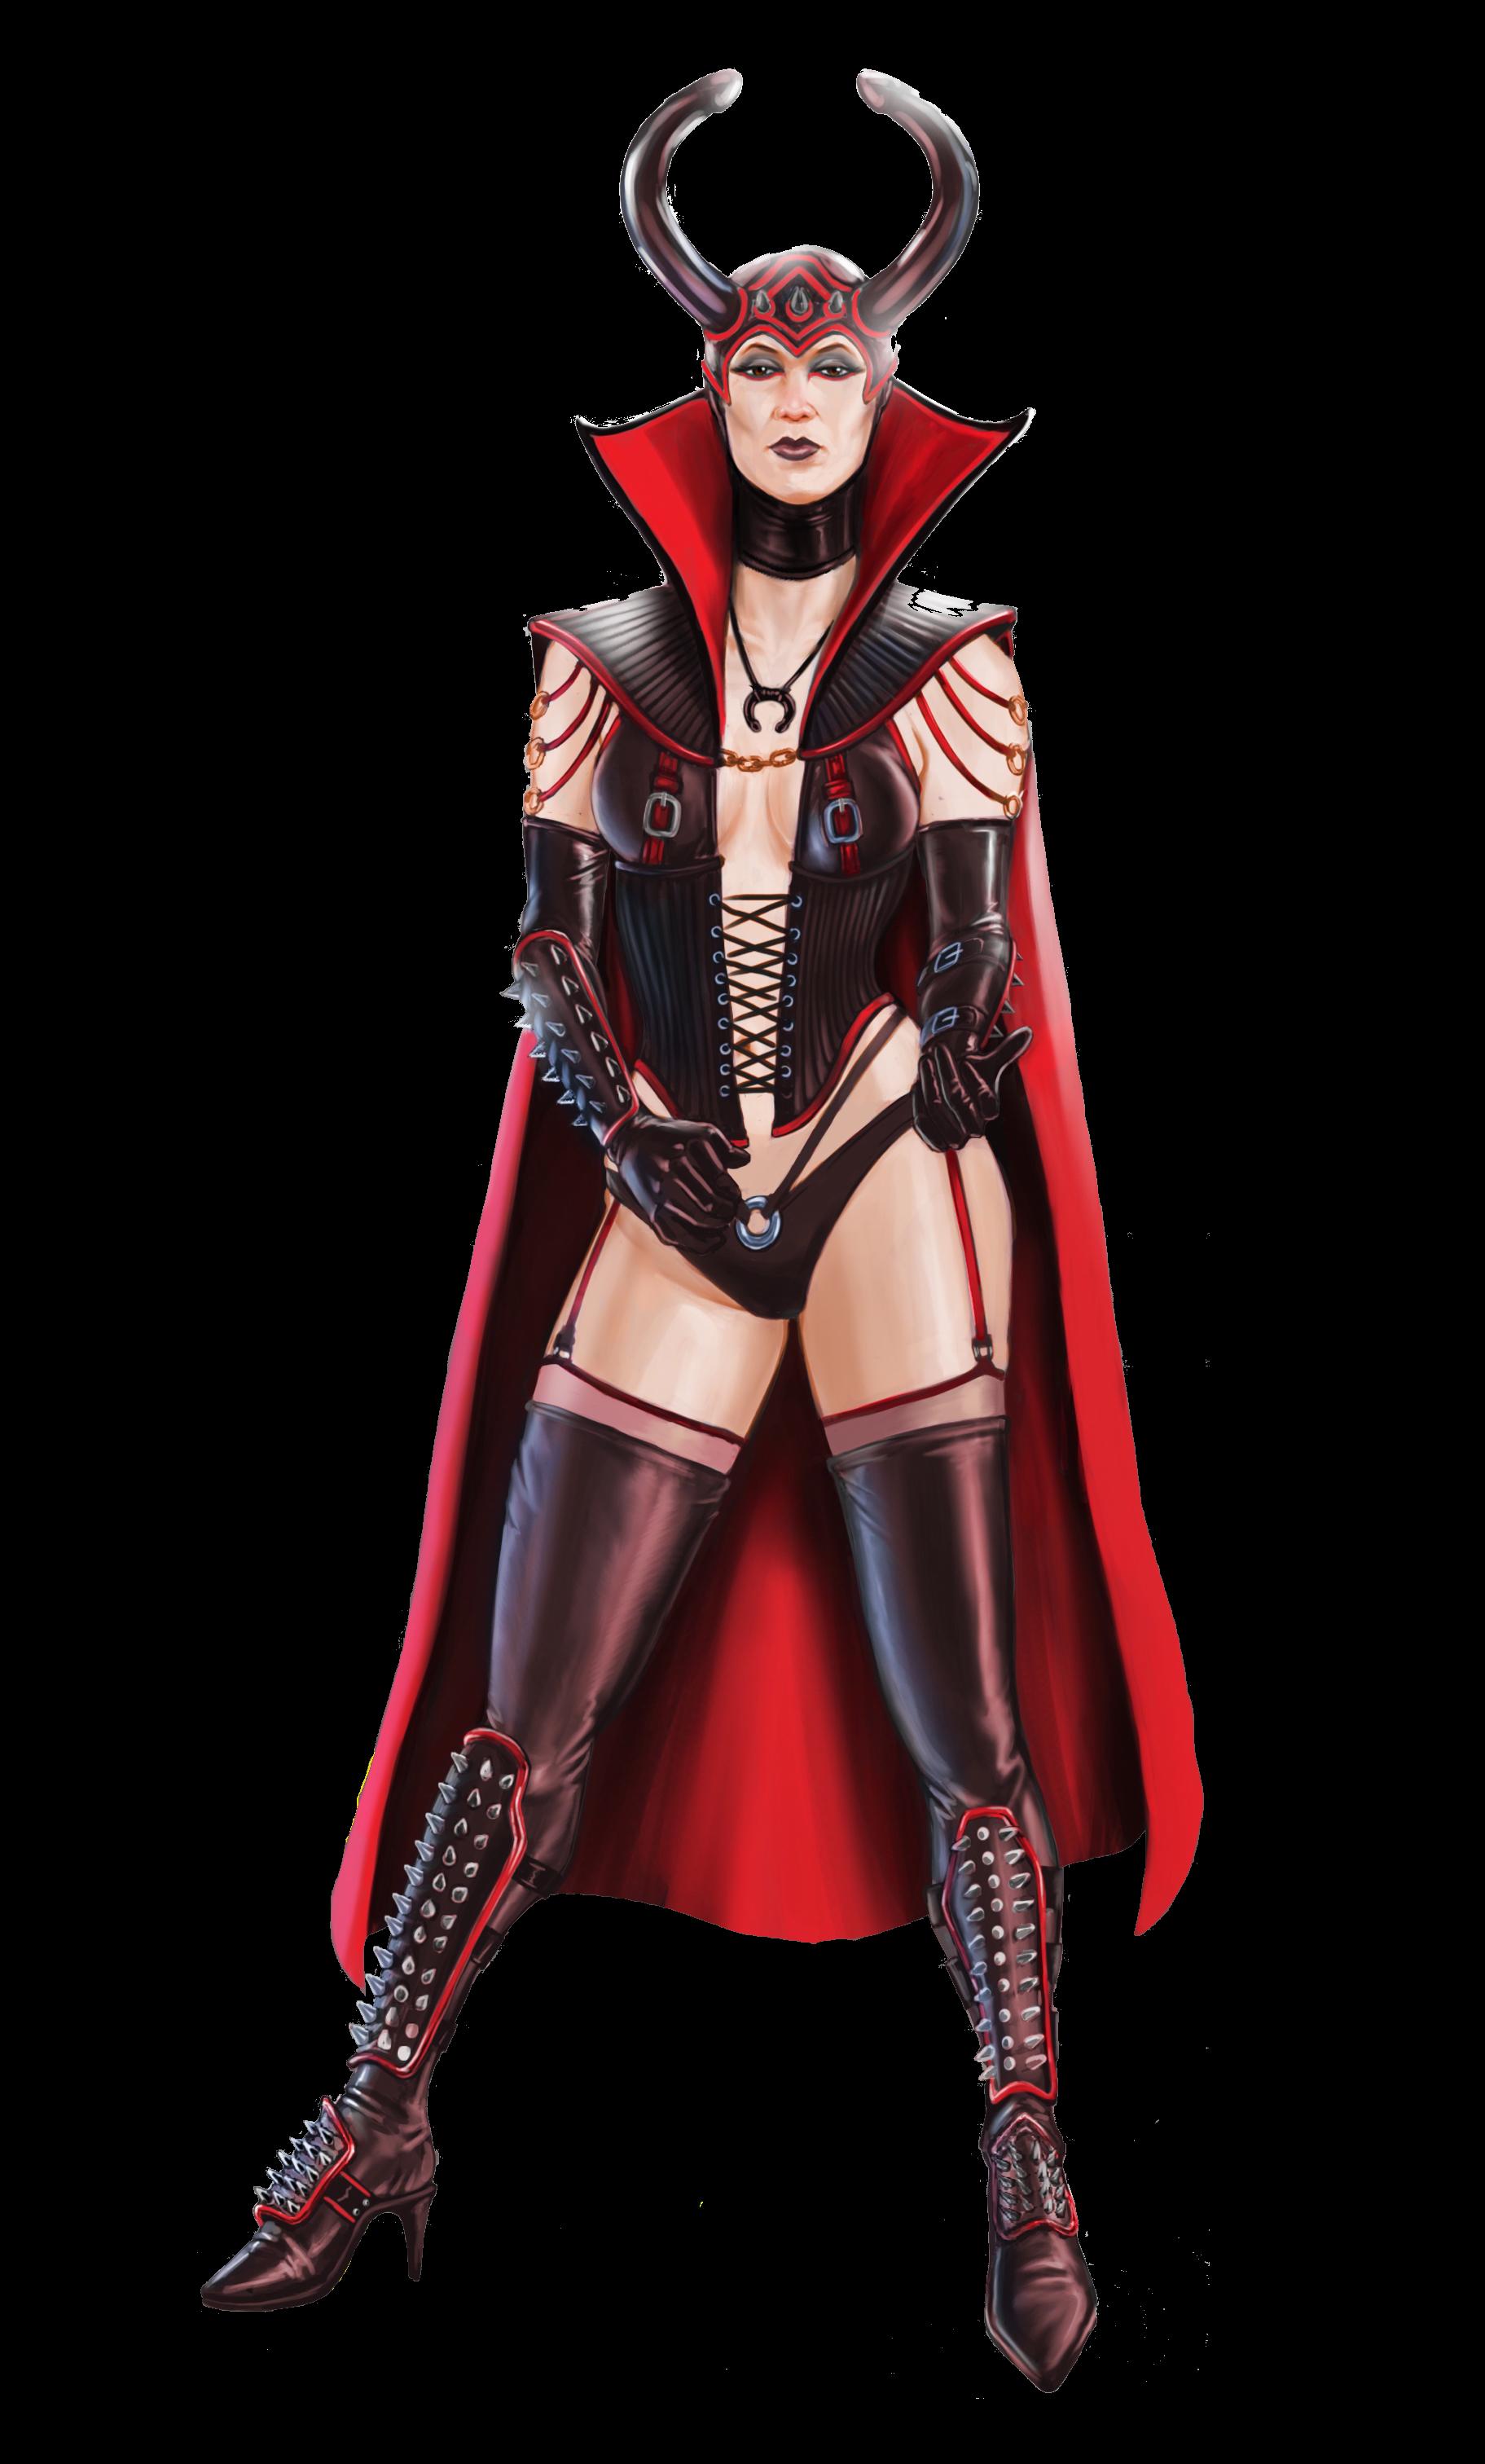 Images of a dominatrix